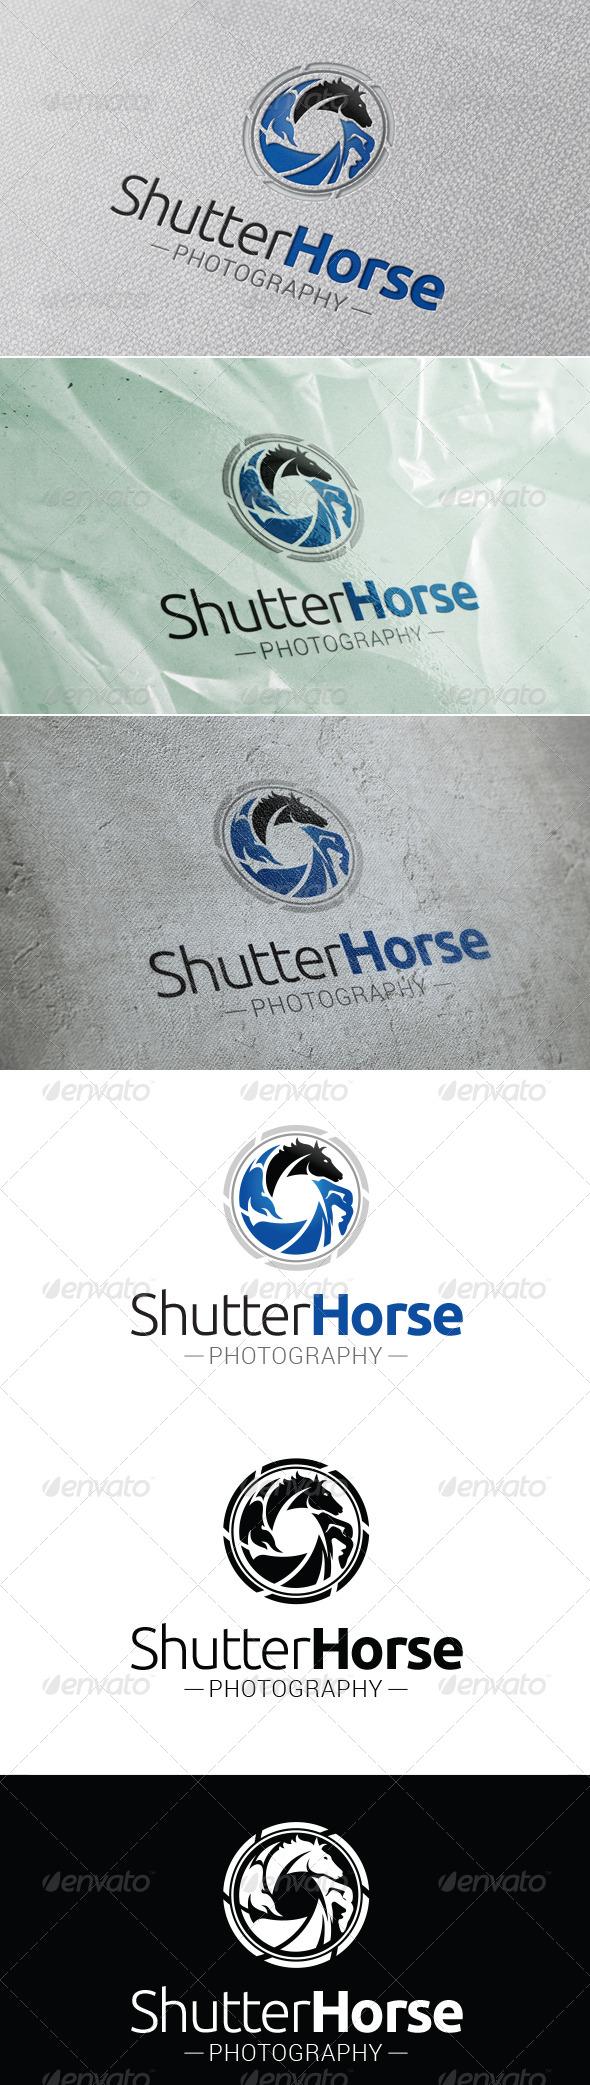 GraphicRiver Shutter Horse Logo Template 7547617